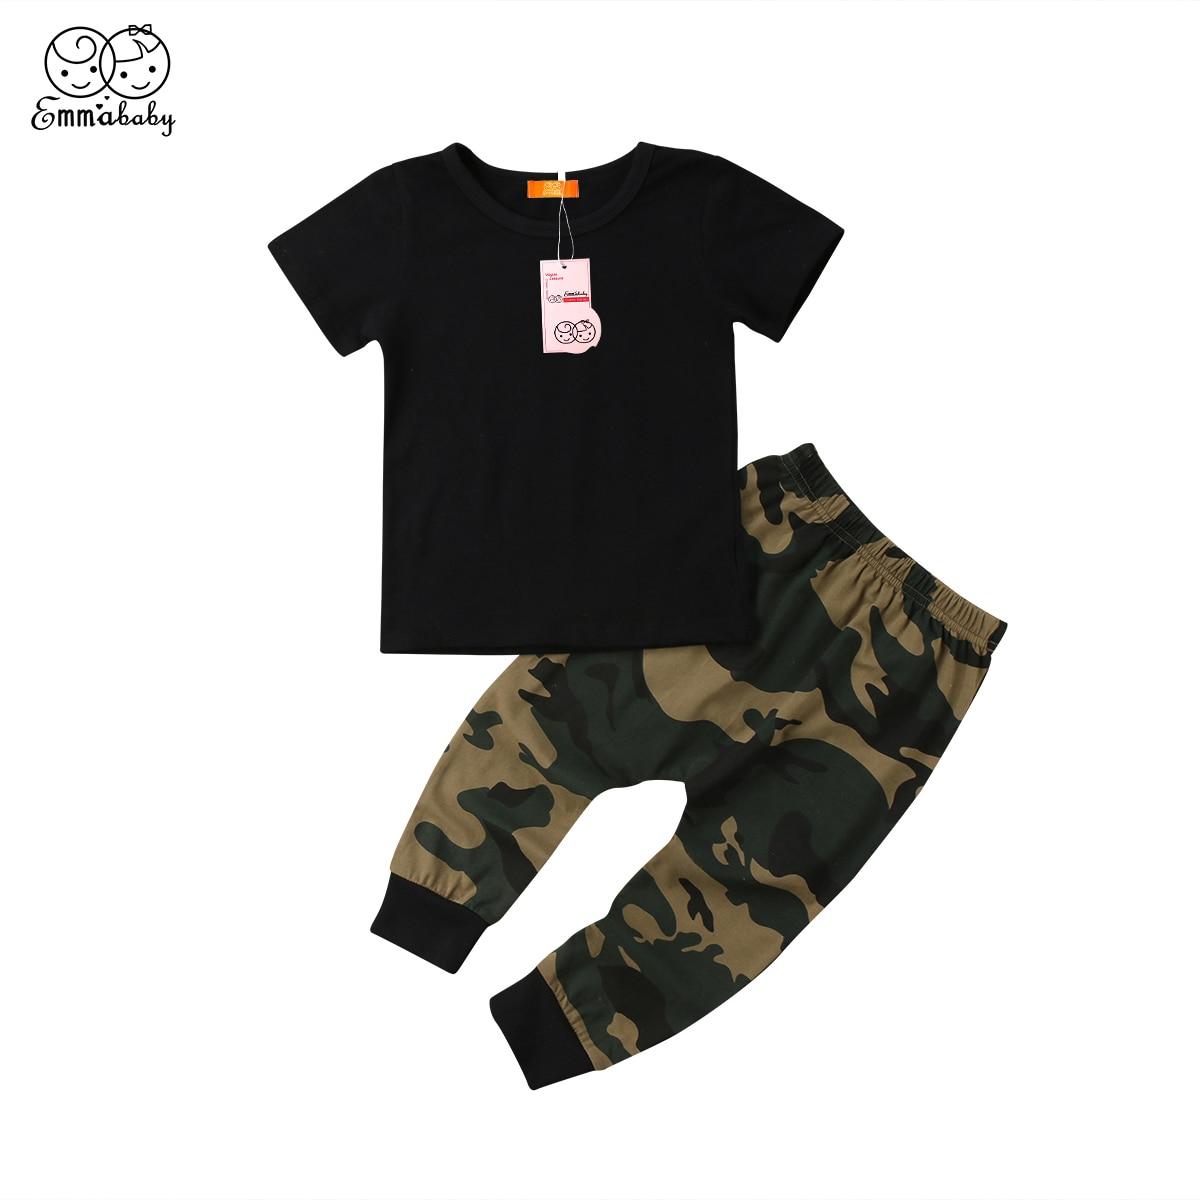 Toddler Kids Baby Girls Short Sleeve Clothes Tops T-shirt Camo Pants 2Pcs Set